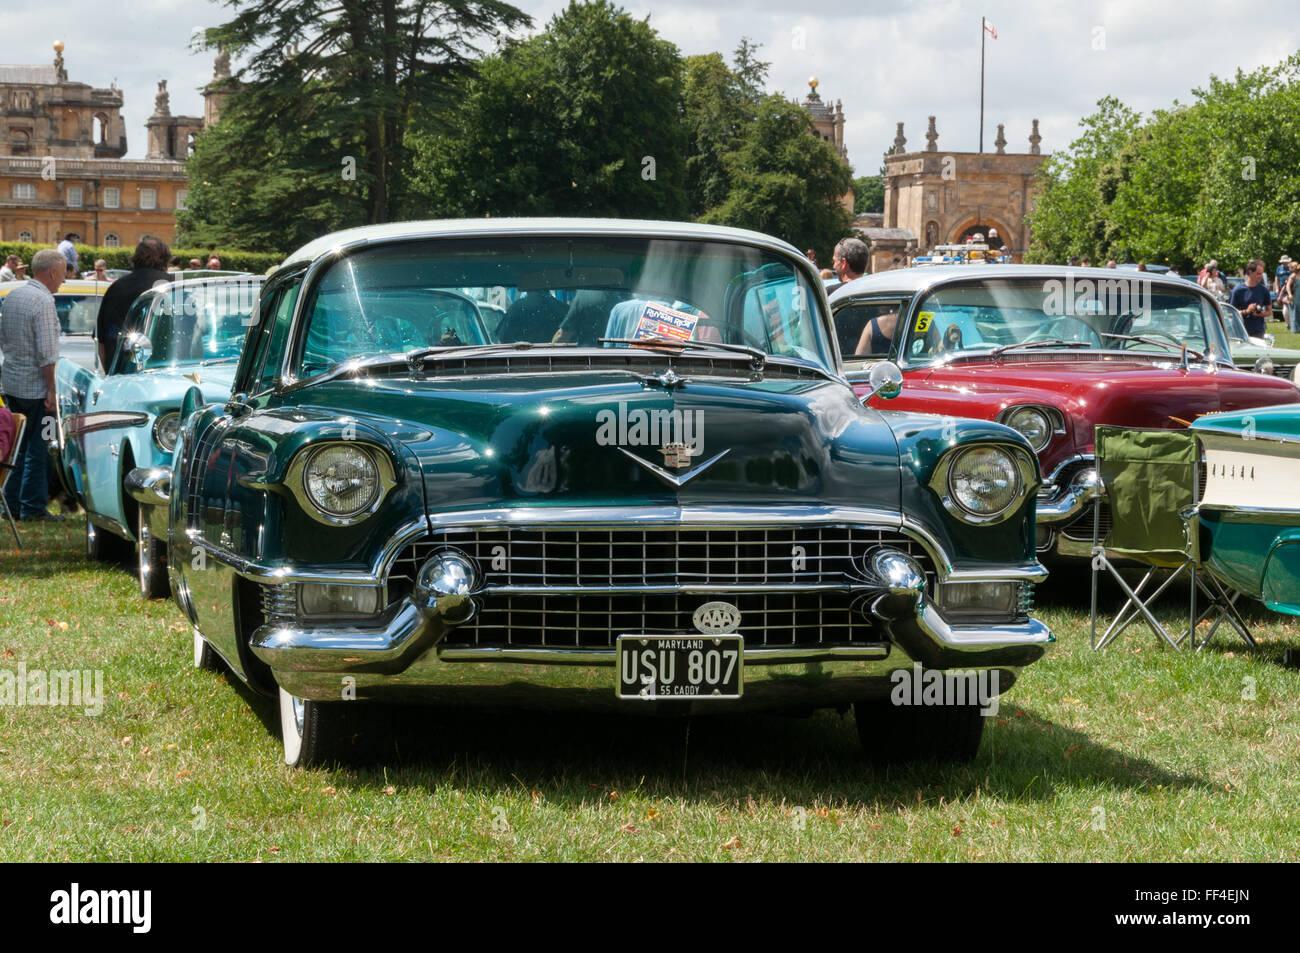 1955 Cadillac Stock Photos Images Alamy Coupe Deville Convertible De Ville American Auto Club Meeting Image